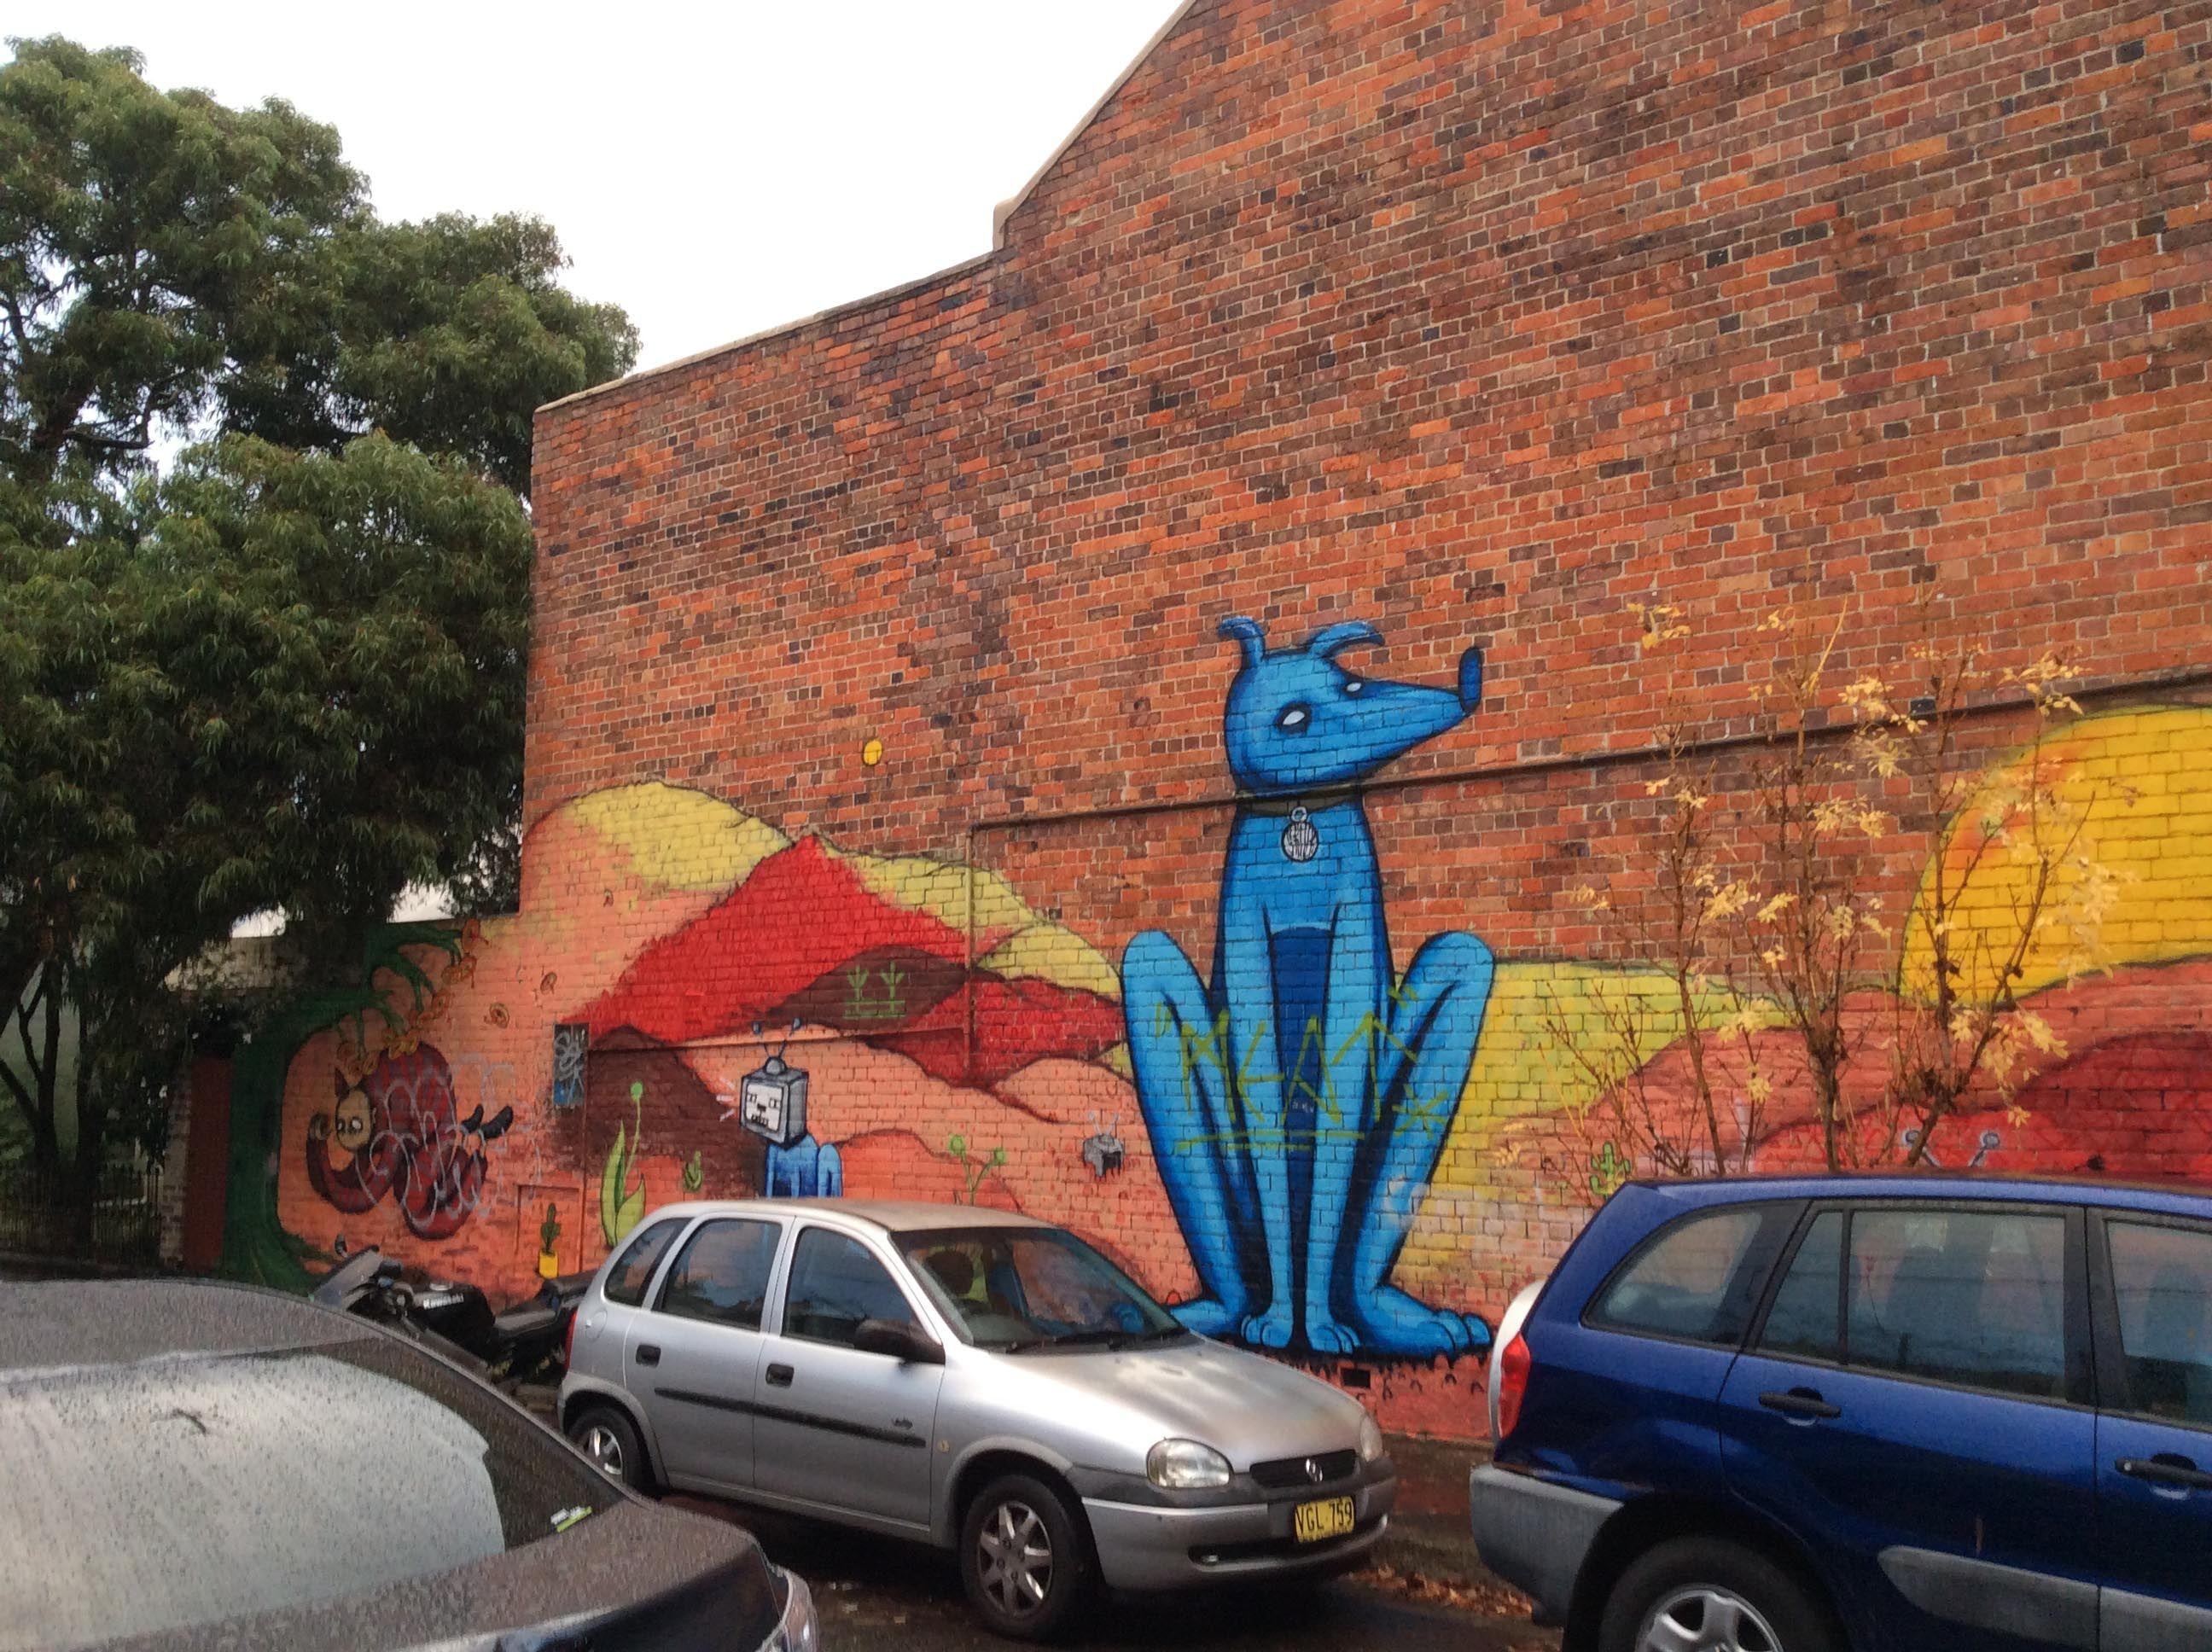 Blue Dog graffiti in situ, Newtown, Sydney